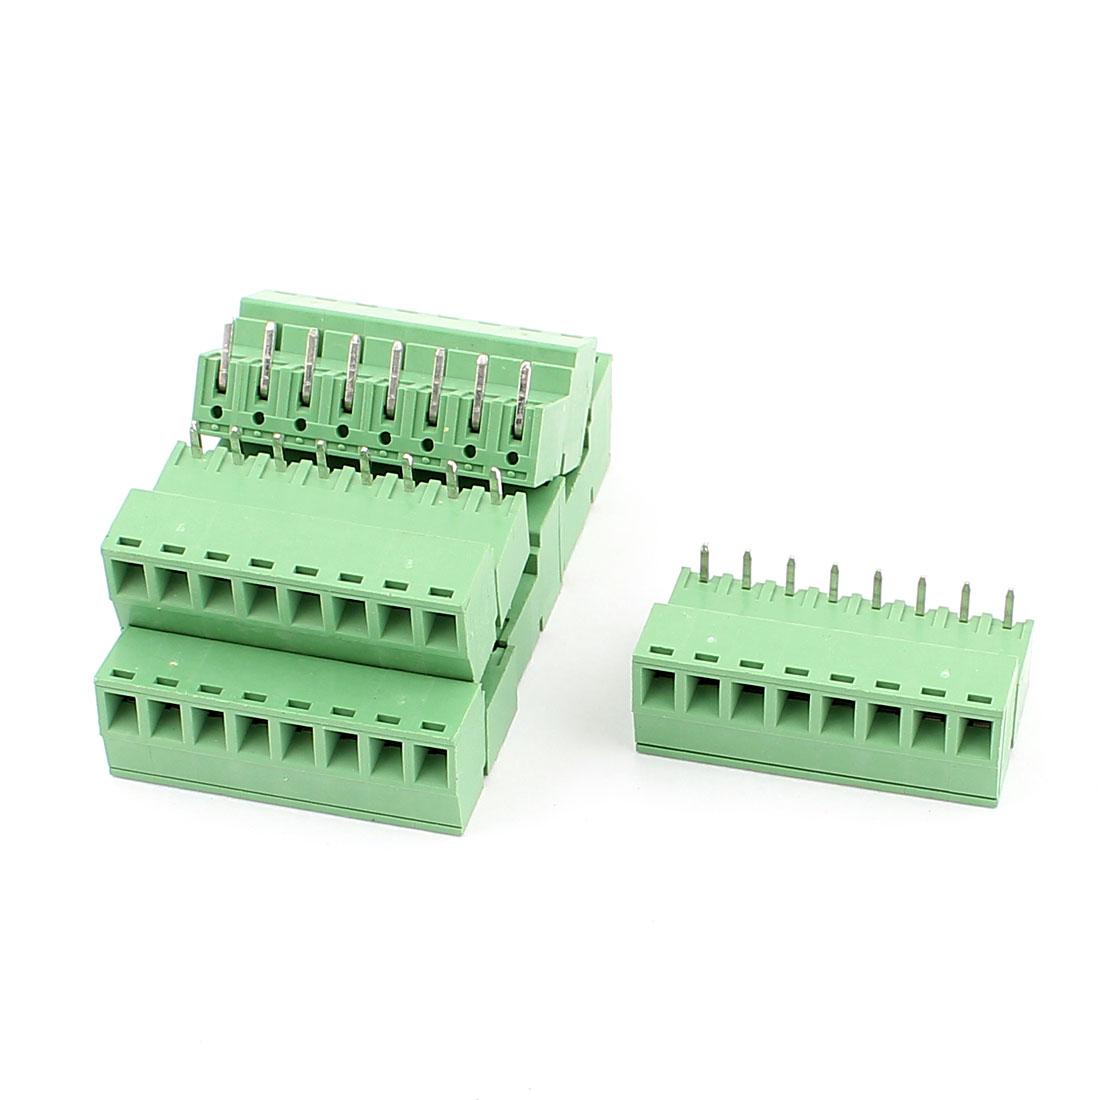 6 Pcs AC 300V 8A 8 Pins PCB Screw Terminal Block Connector 3.81mm Pitch Green